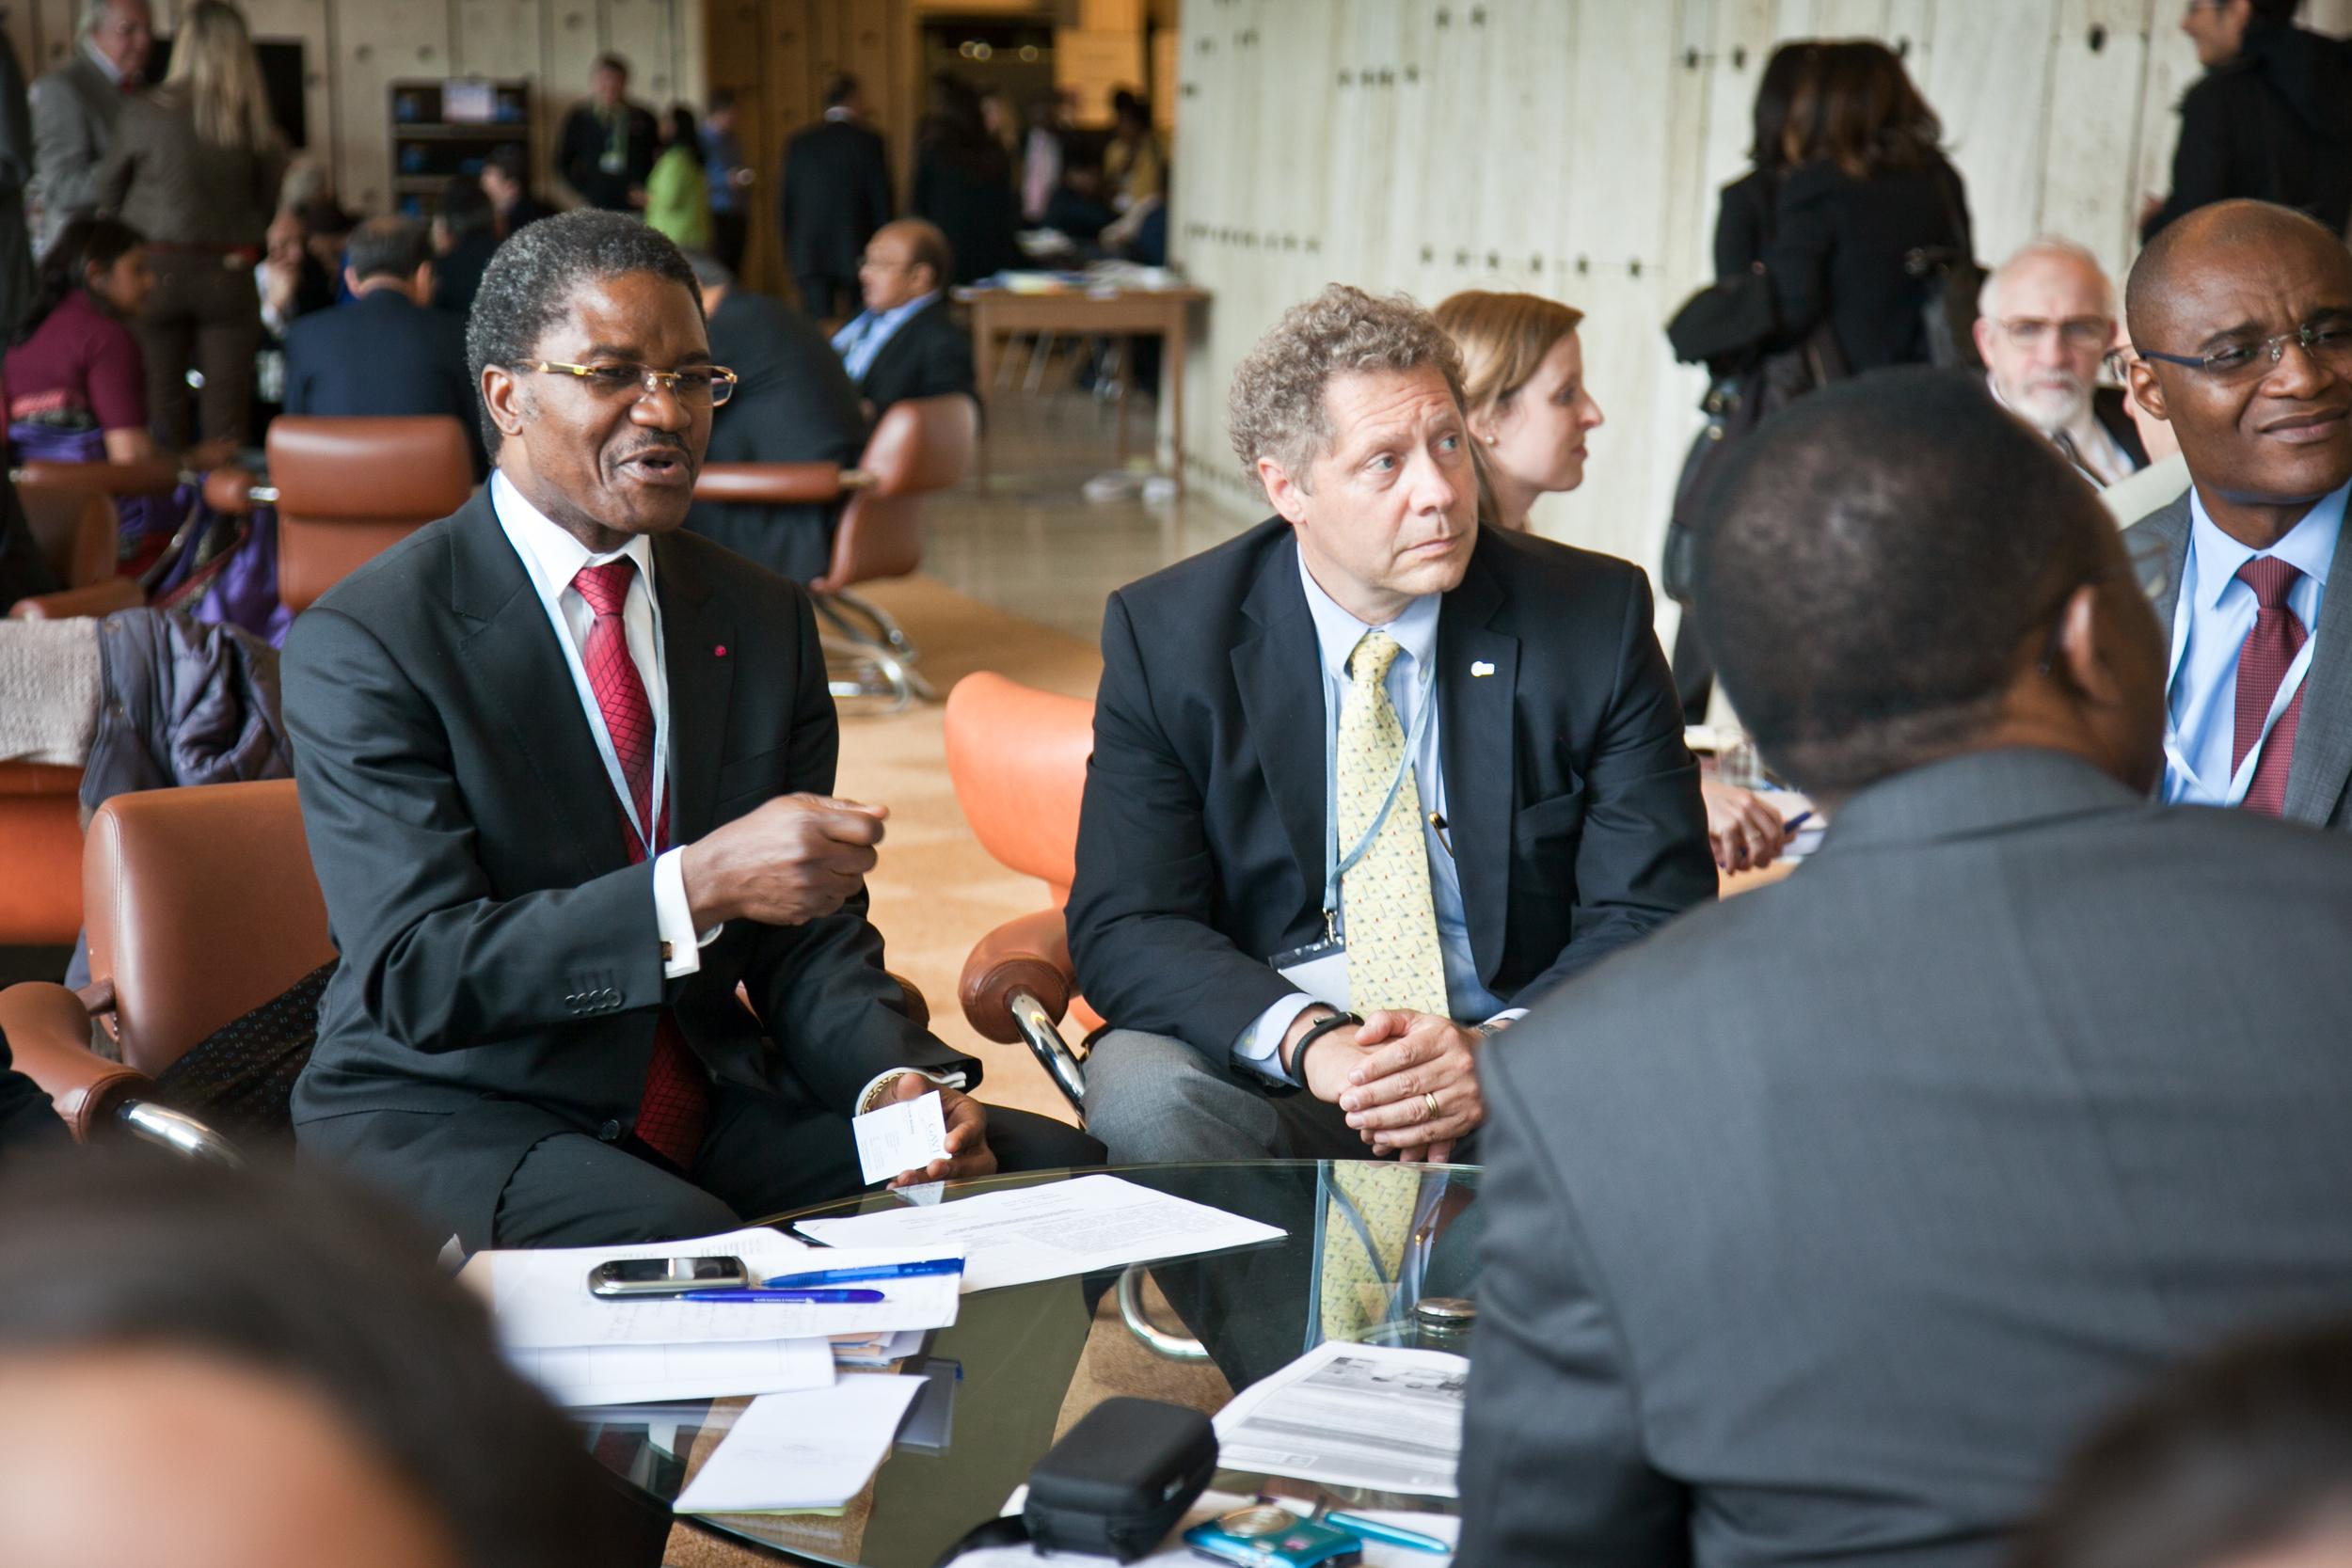 trisa-taro-gavi-countries-meeting-world-health-assembly-2013.jpg